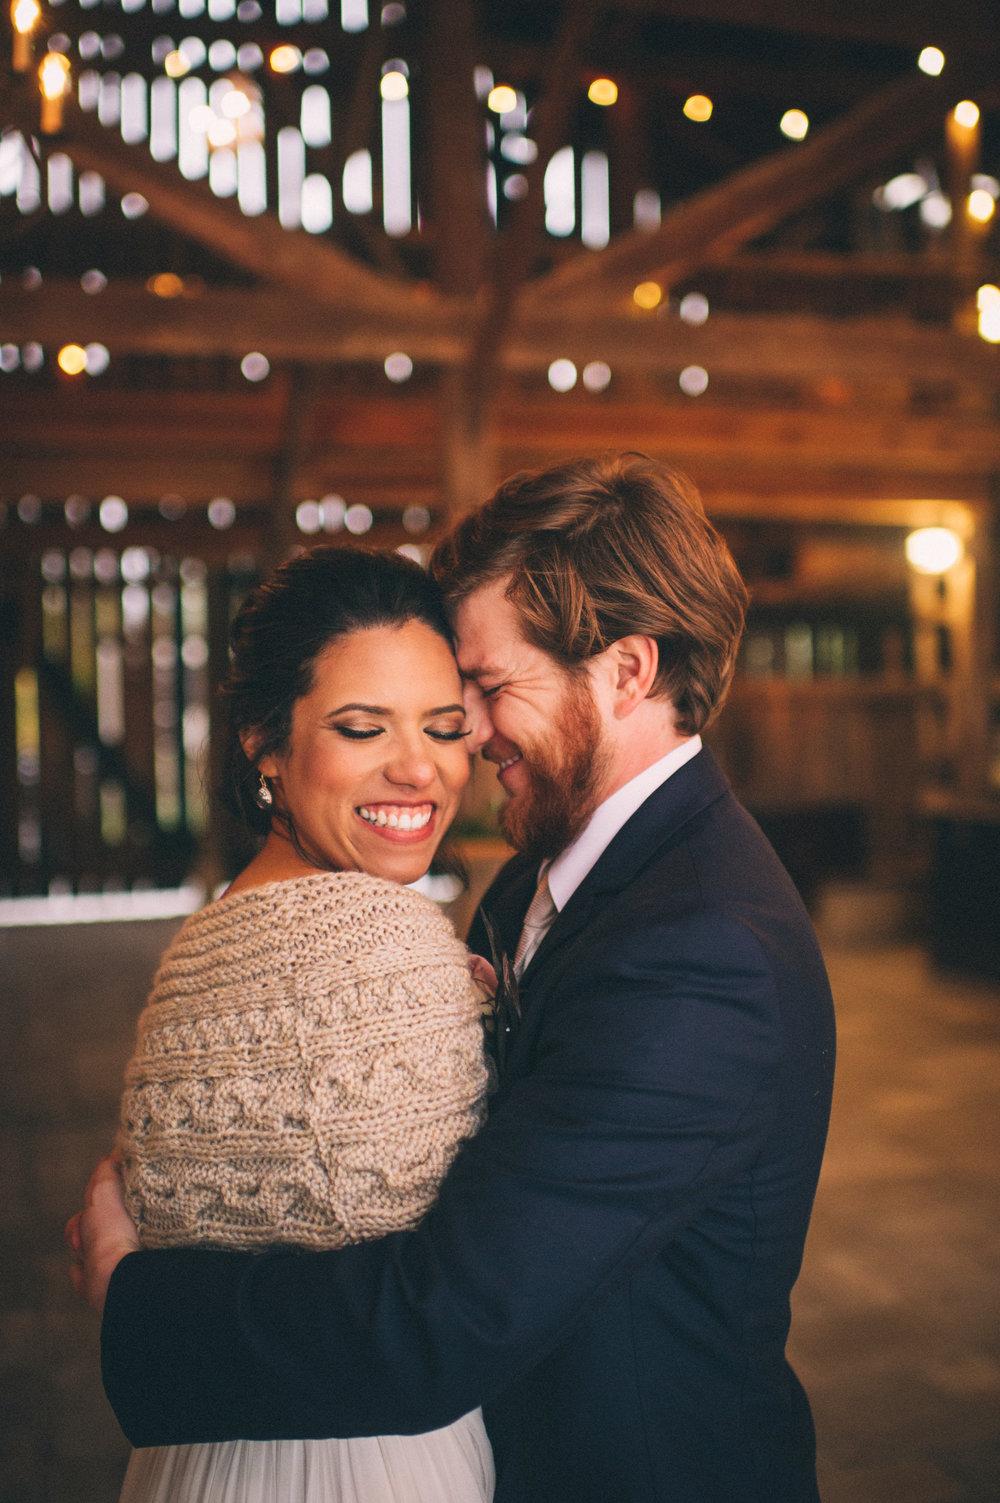 Micaha & Austin // Cozy Autumn Wedding at Springhouse Gardens // Lexington, Kentucky // Wedding Photography // Couple Portrait